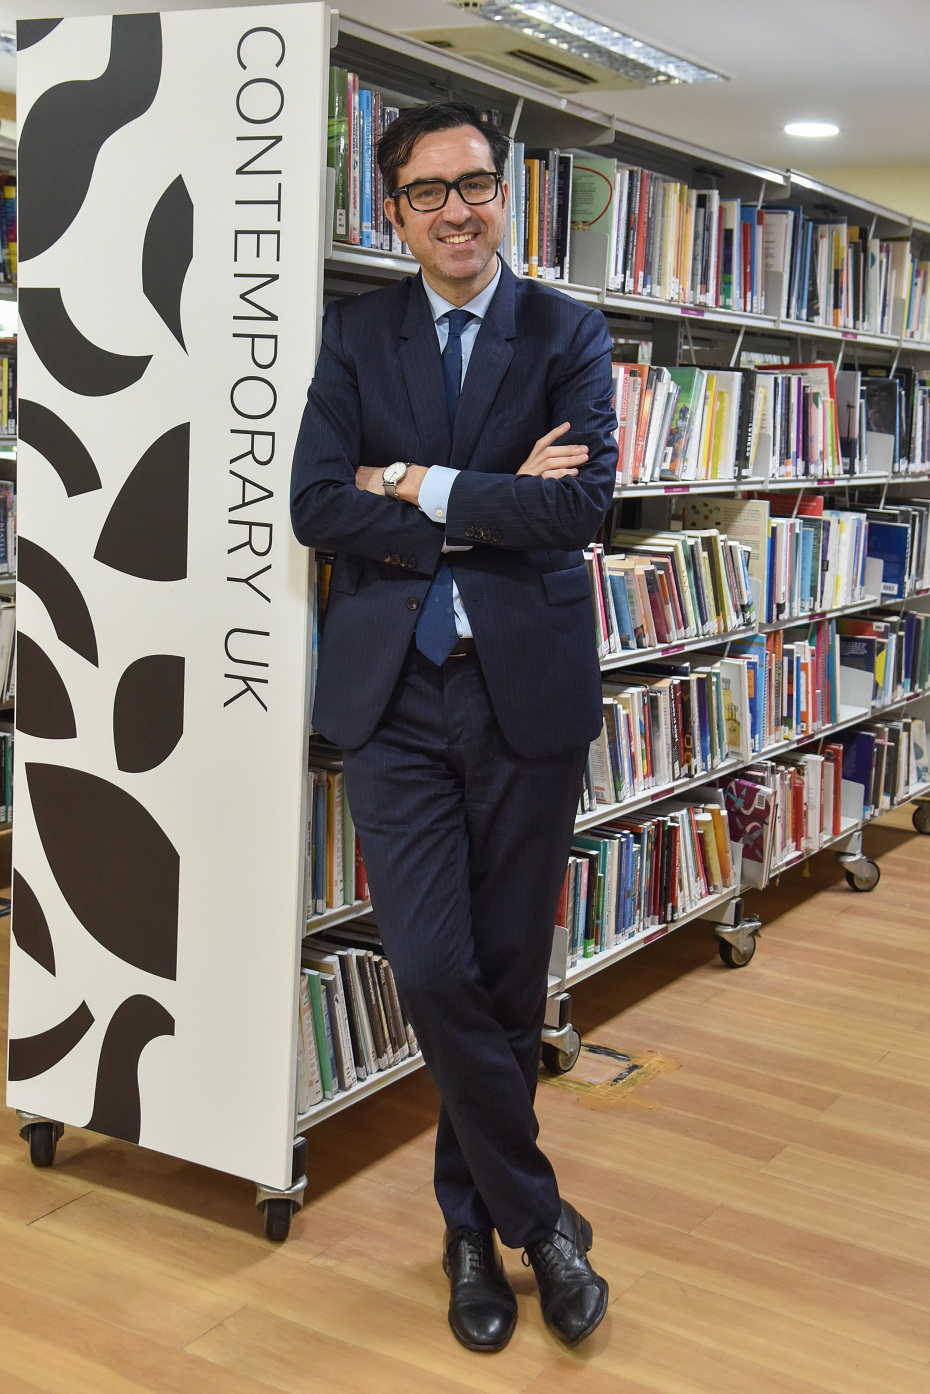 Alan Gemmell, director, British Council, India.